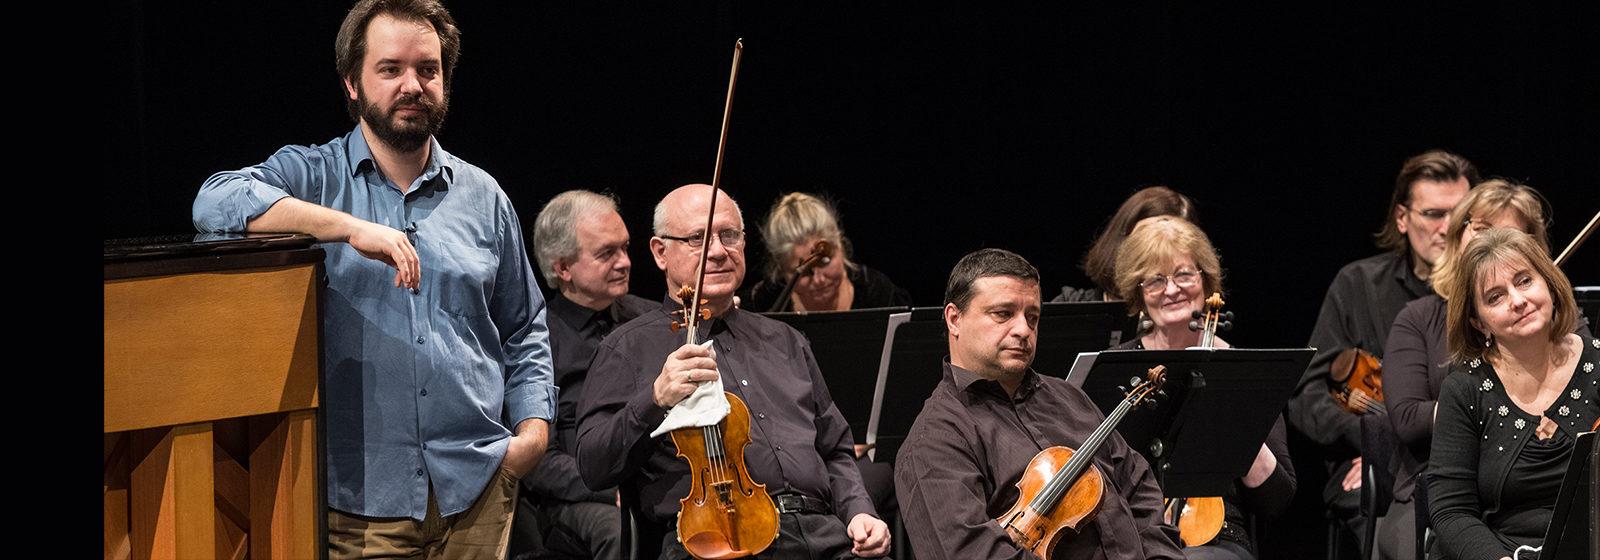 Koncertáriák Maurice Delage, Mozart, Haydn és Johann Strauss művei